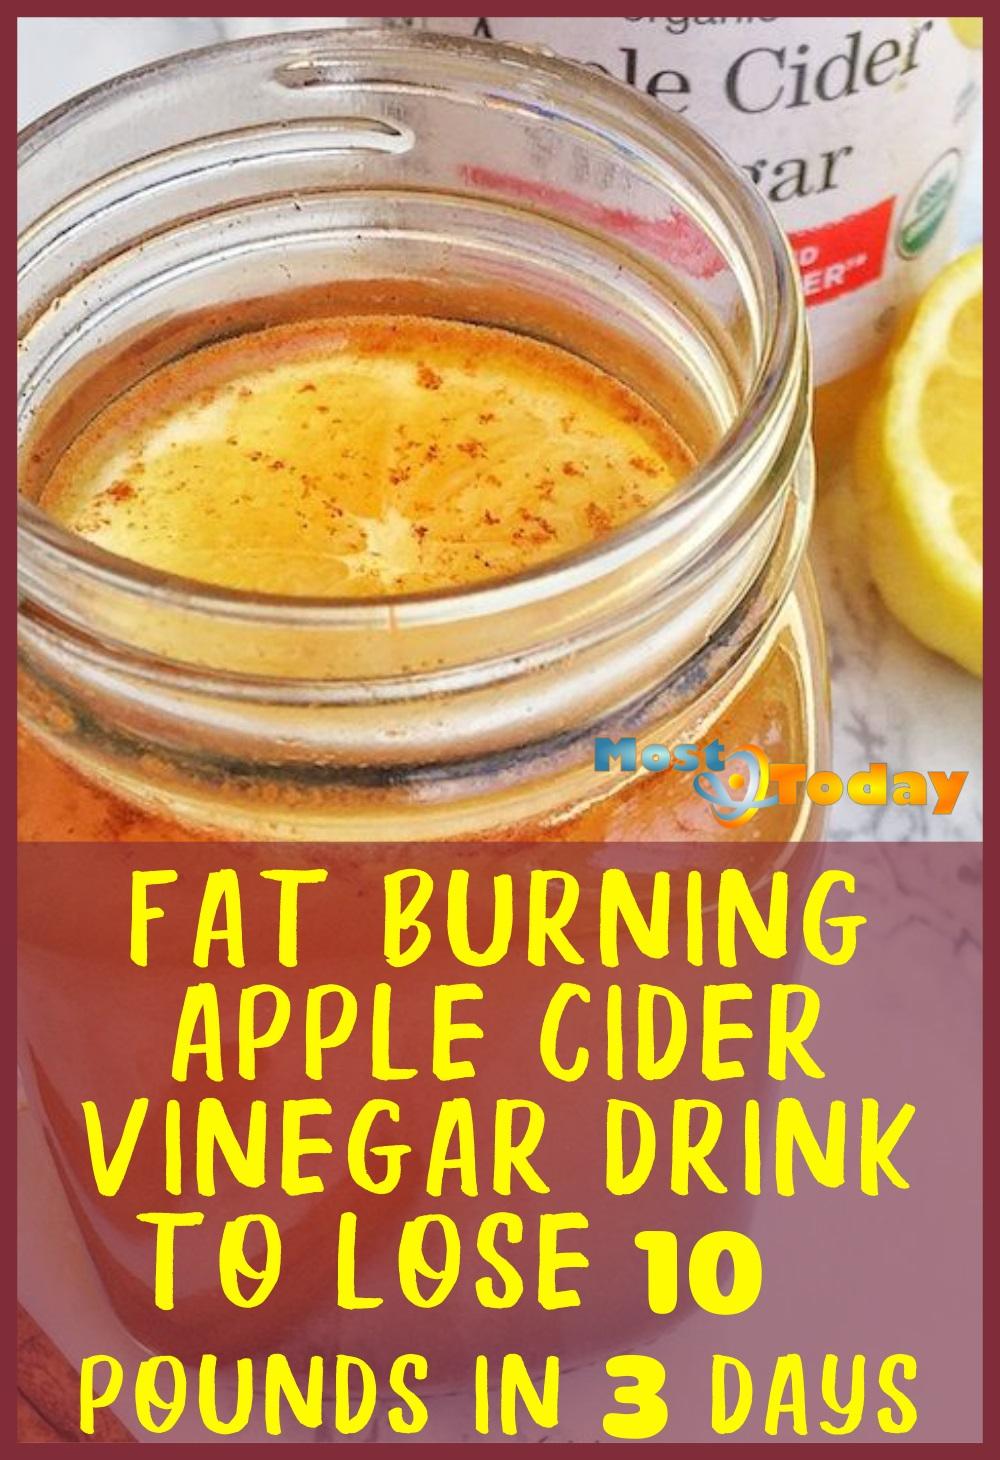 Fat Burning Apple Cider Vinegar Drink To Lose 10 Pounds In